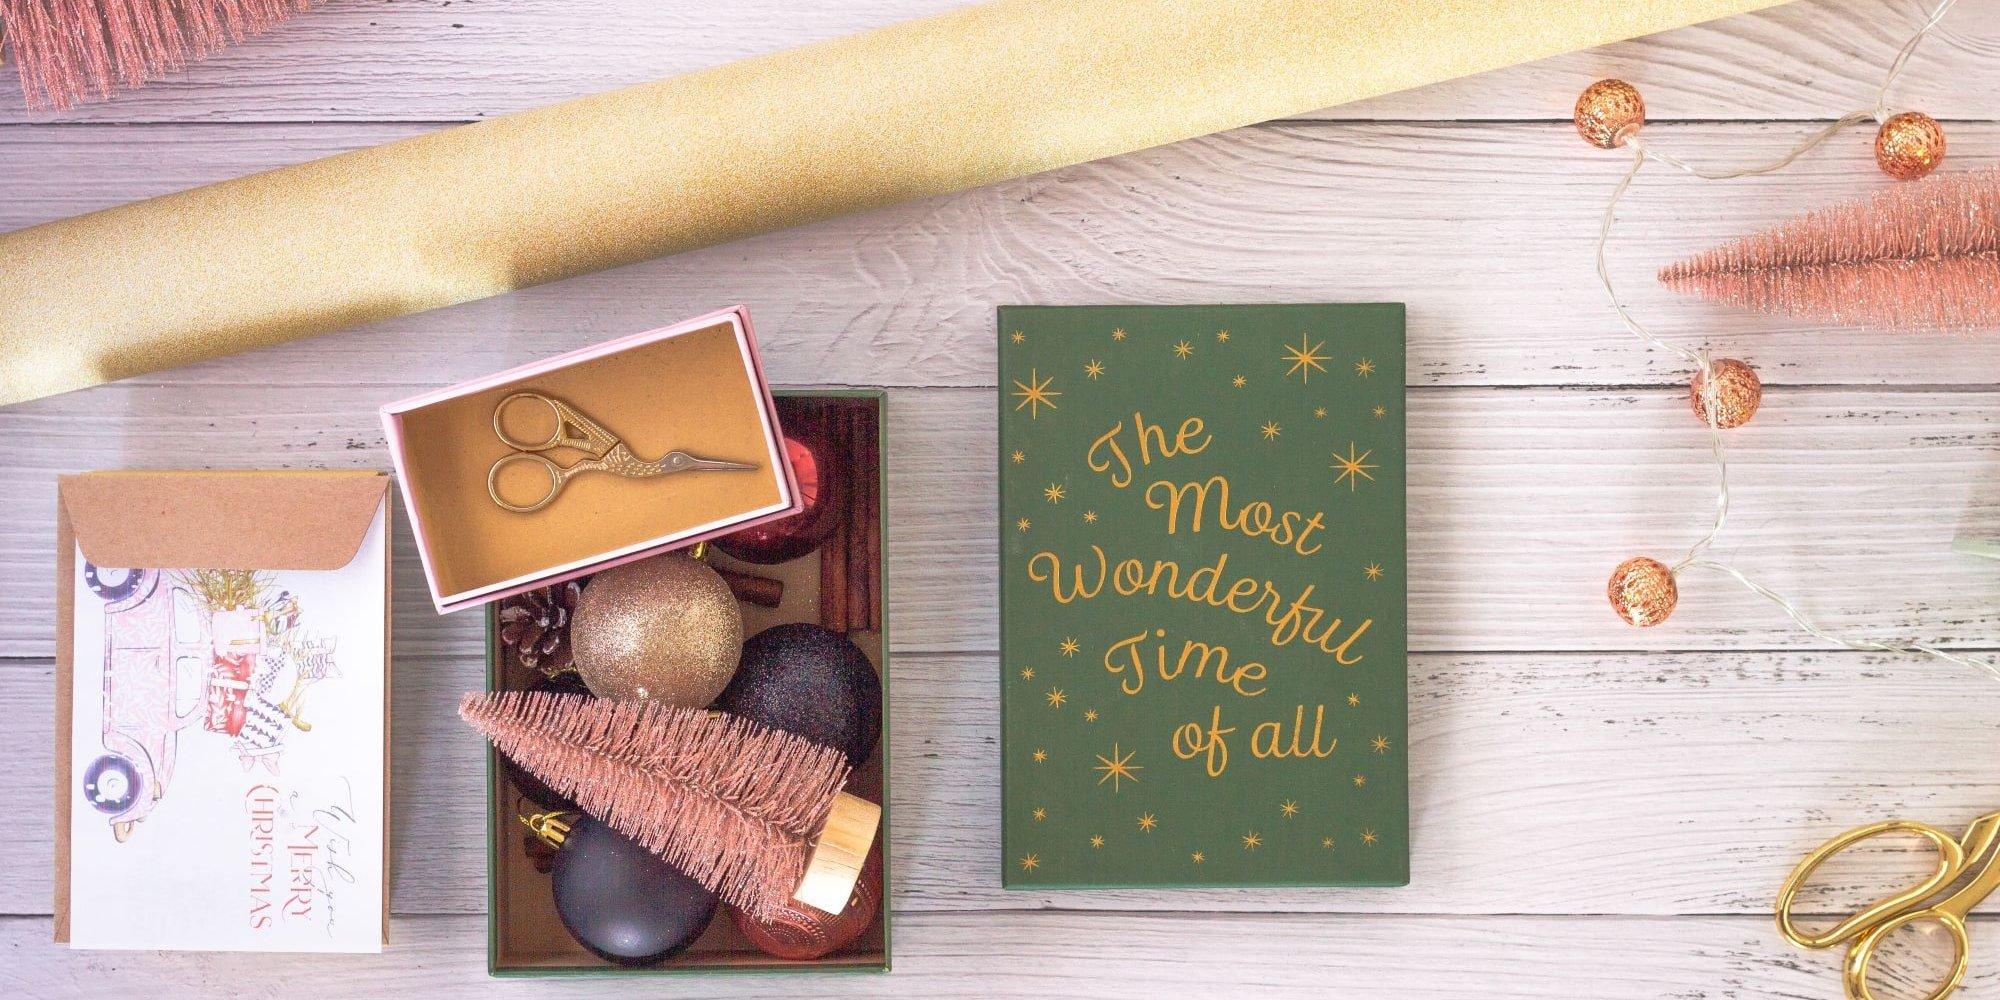 christmas decor and gift wrapping supplies